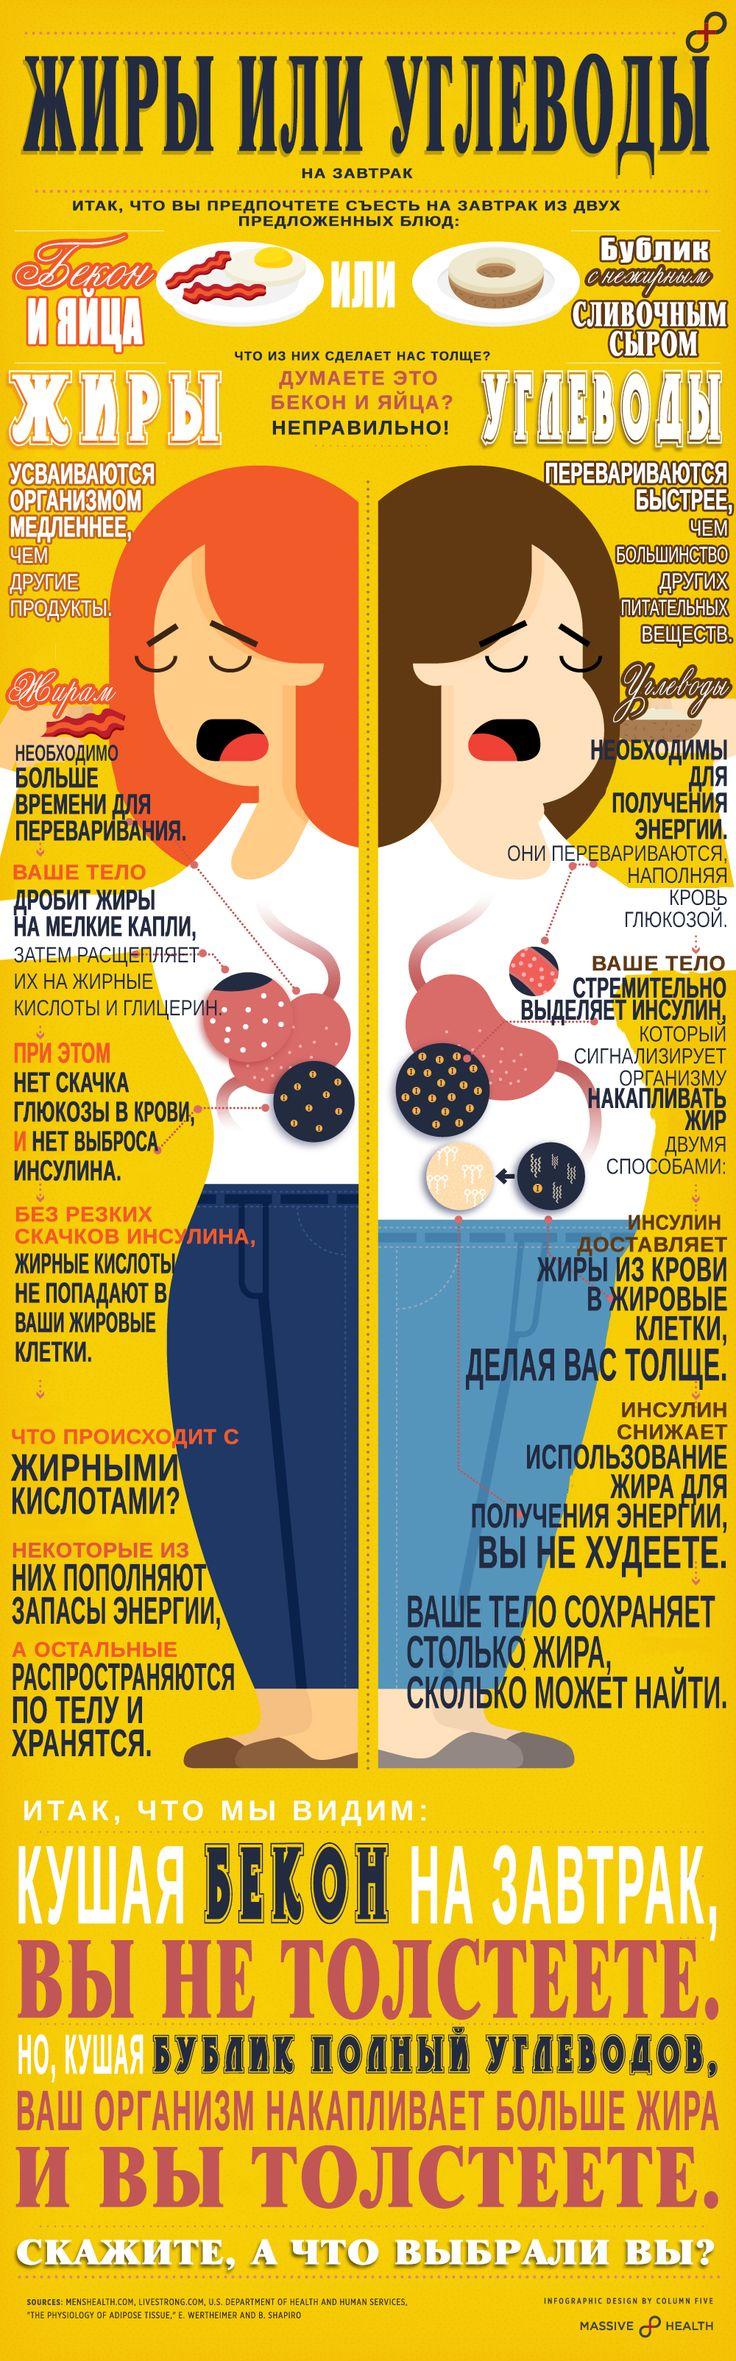 Жиры, углеводы